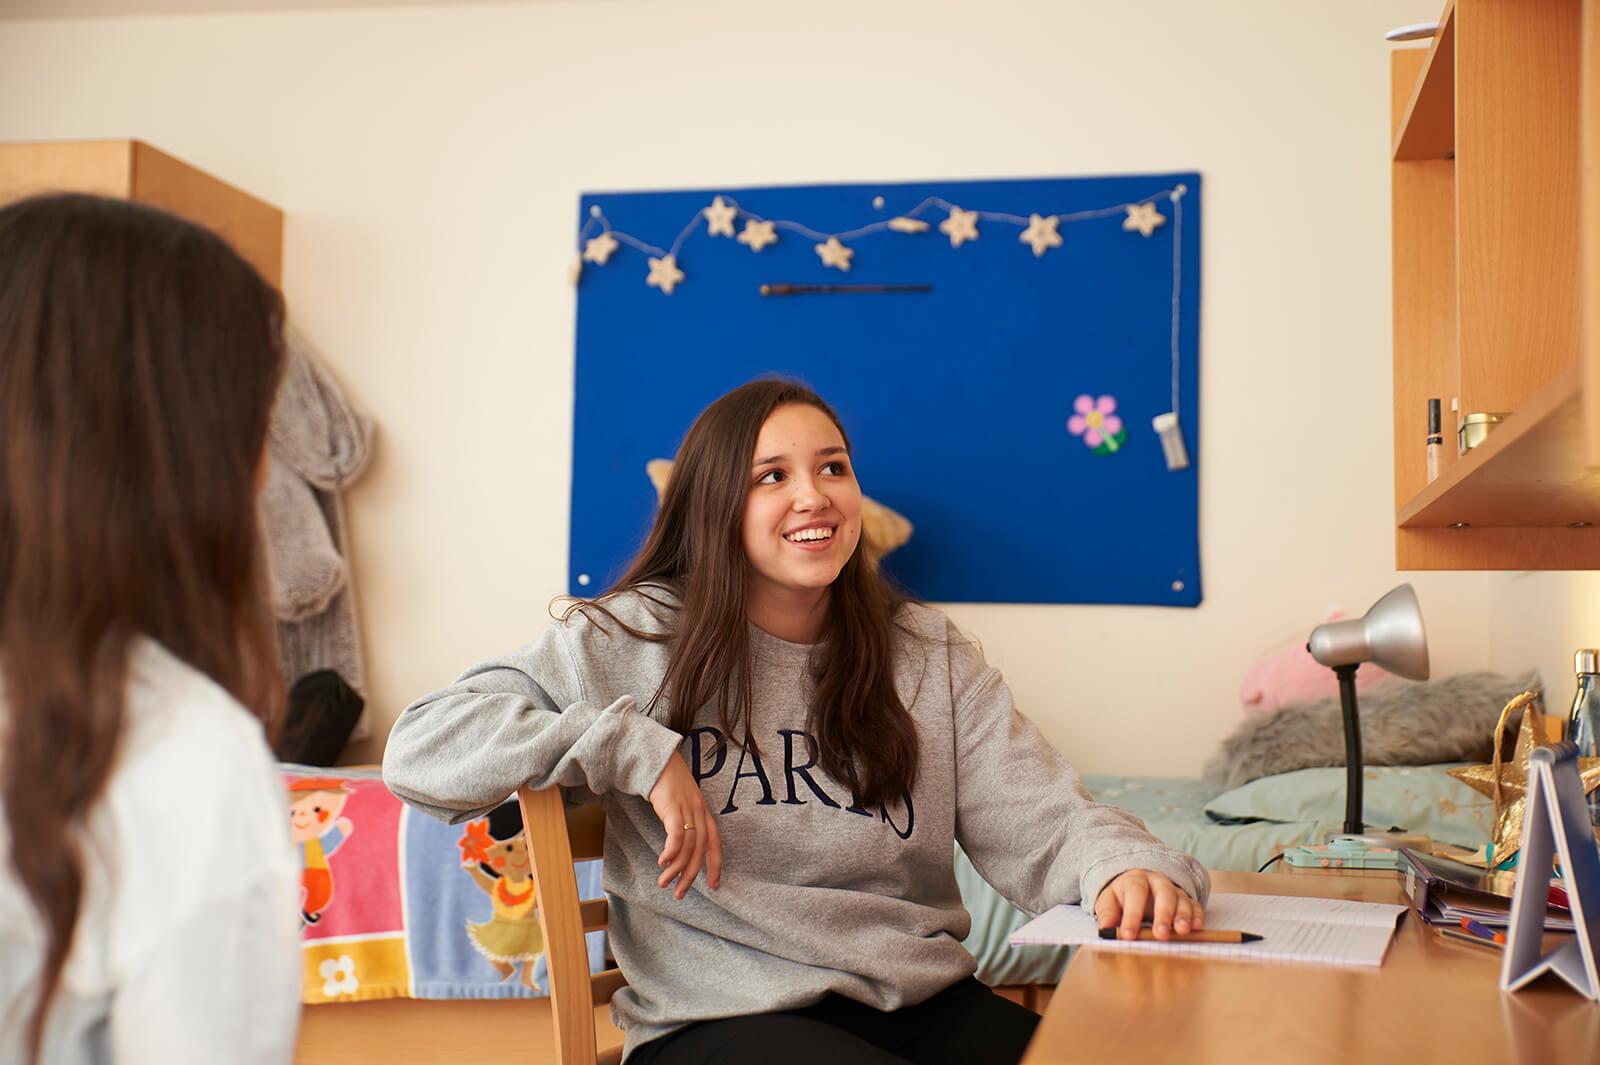 Girl smiling in her room